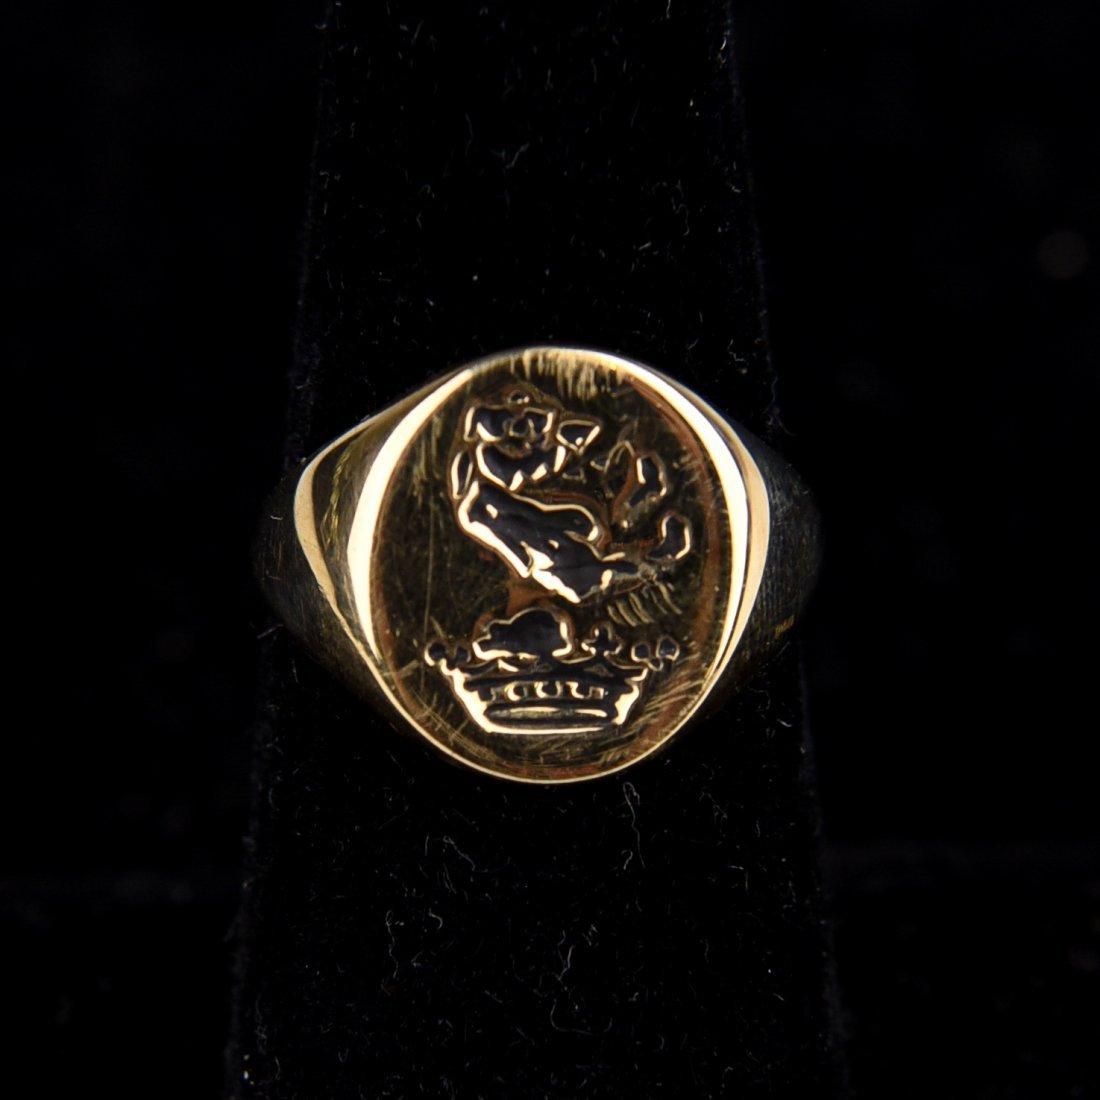 GOLD SIGNET CREST RING